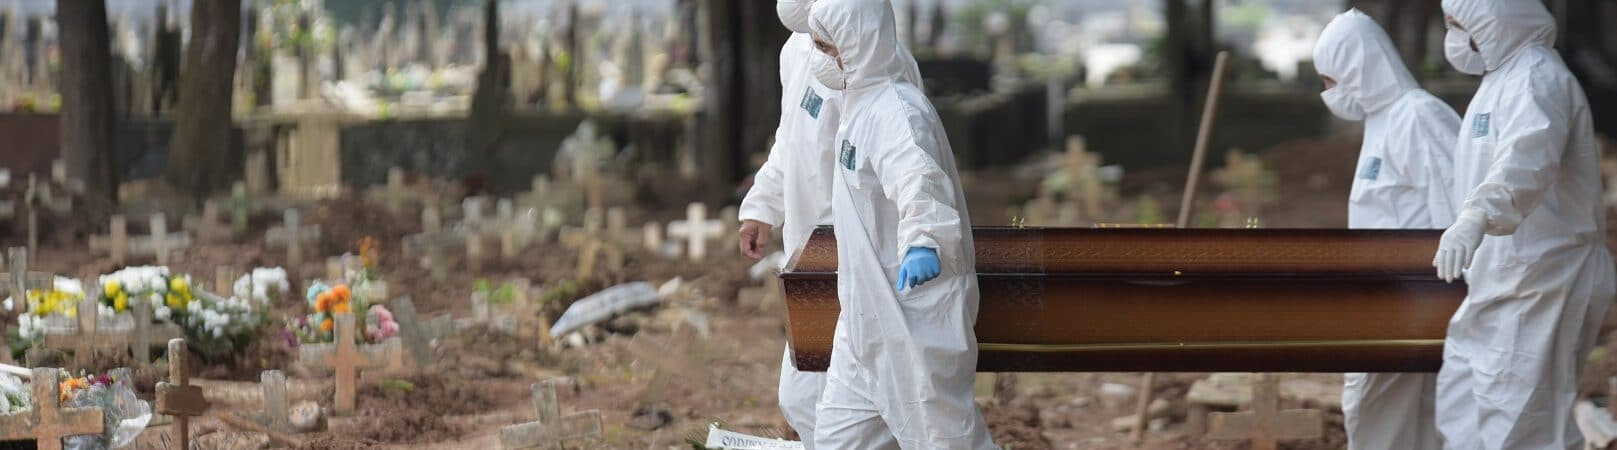 Covid-19: Brasil tem 1.138 mortes nas últimas 24h; total ultrapassa 278 mil